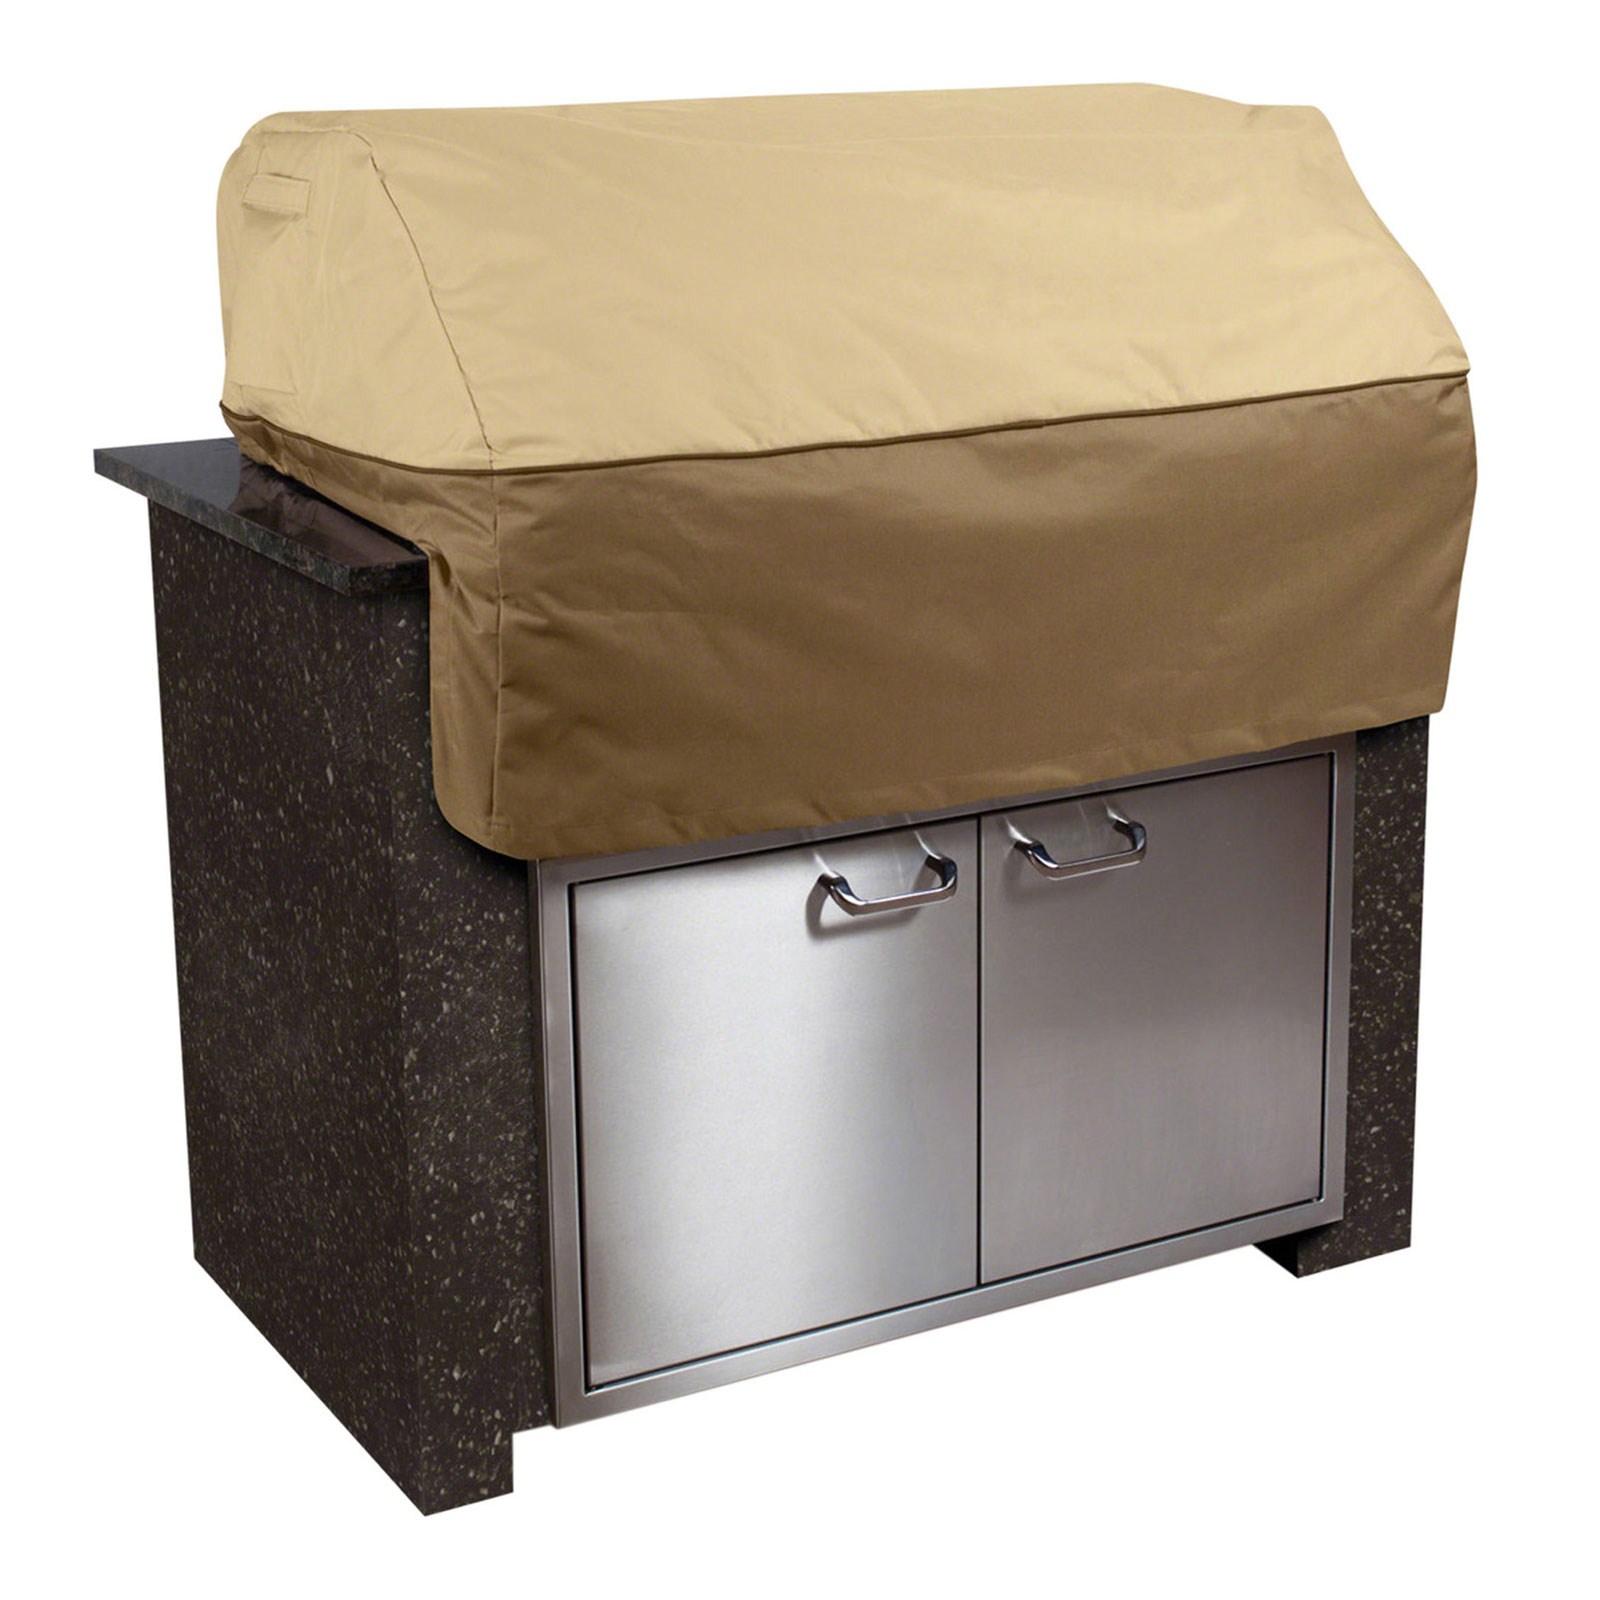 large outdoor furniture covers. Veranda Large Island Grill Cover, Outdoor Furniture Covers 4